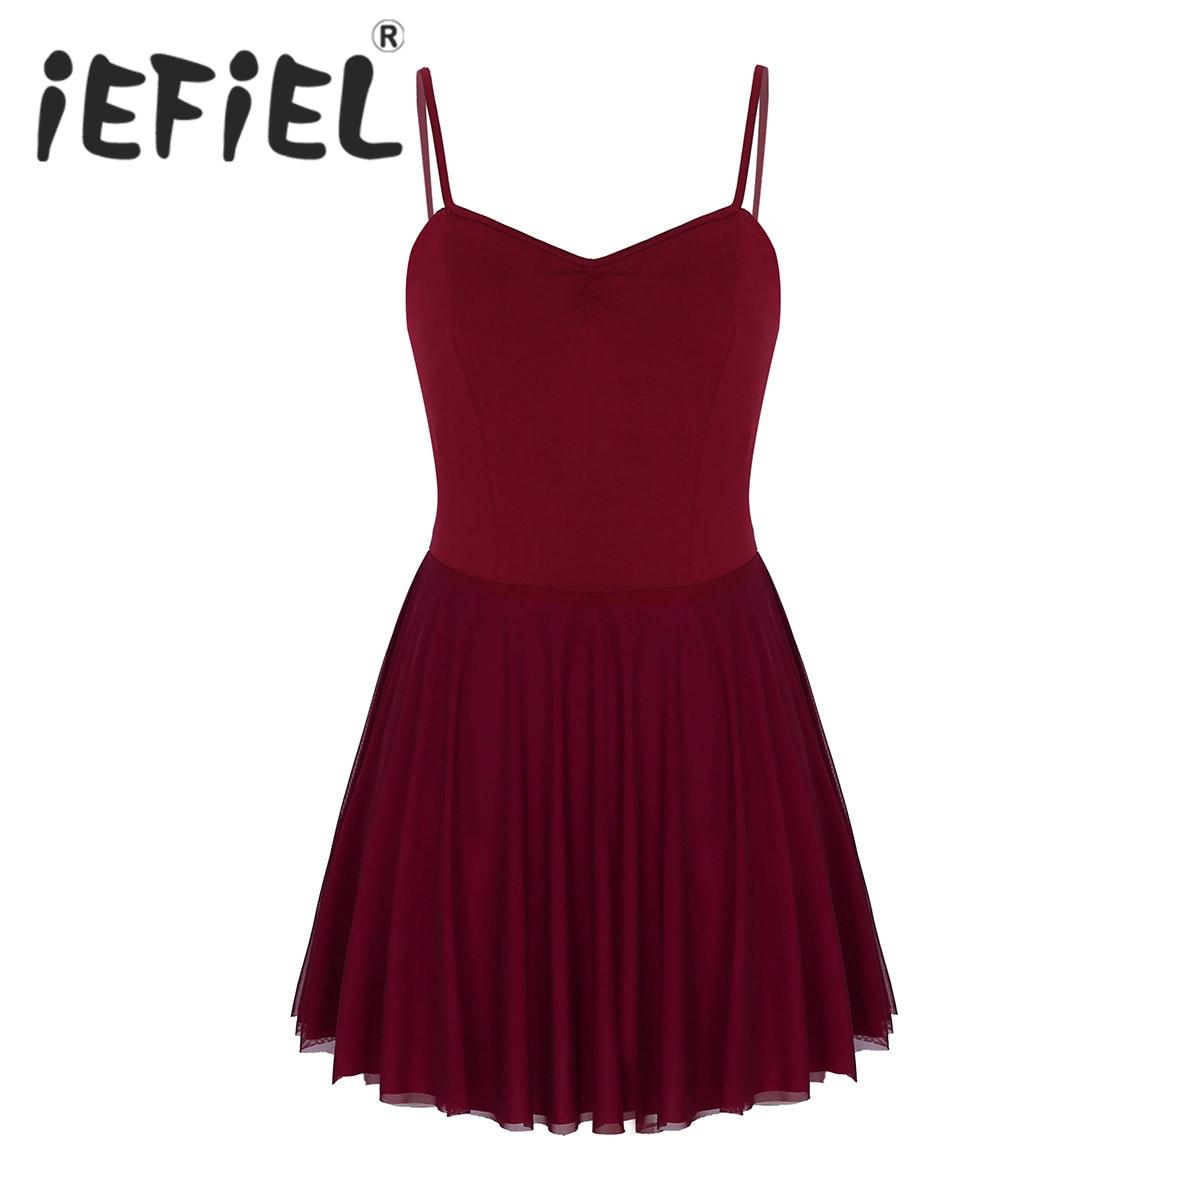 iEFiEL Women Adult Girls Teenage  Deep V Neckline Built In Shelf Bra Leotard Gymnastics Bodysuit Ballet Performance Dancewear